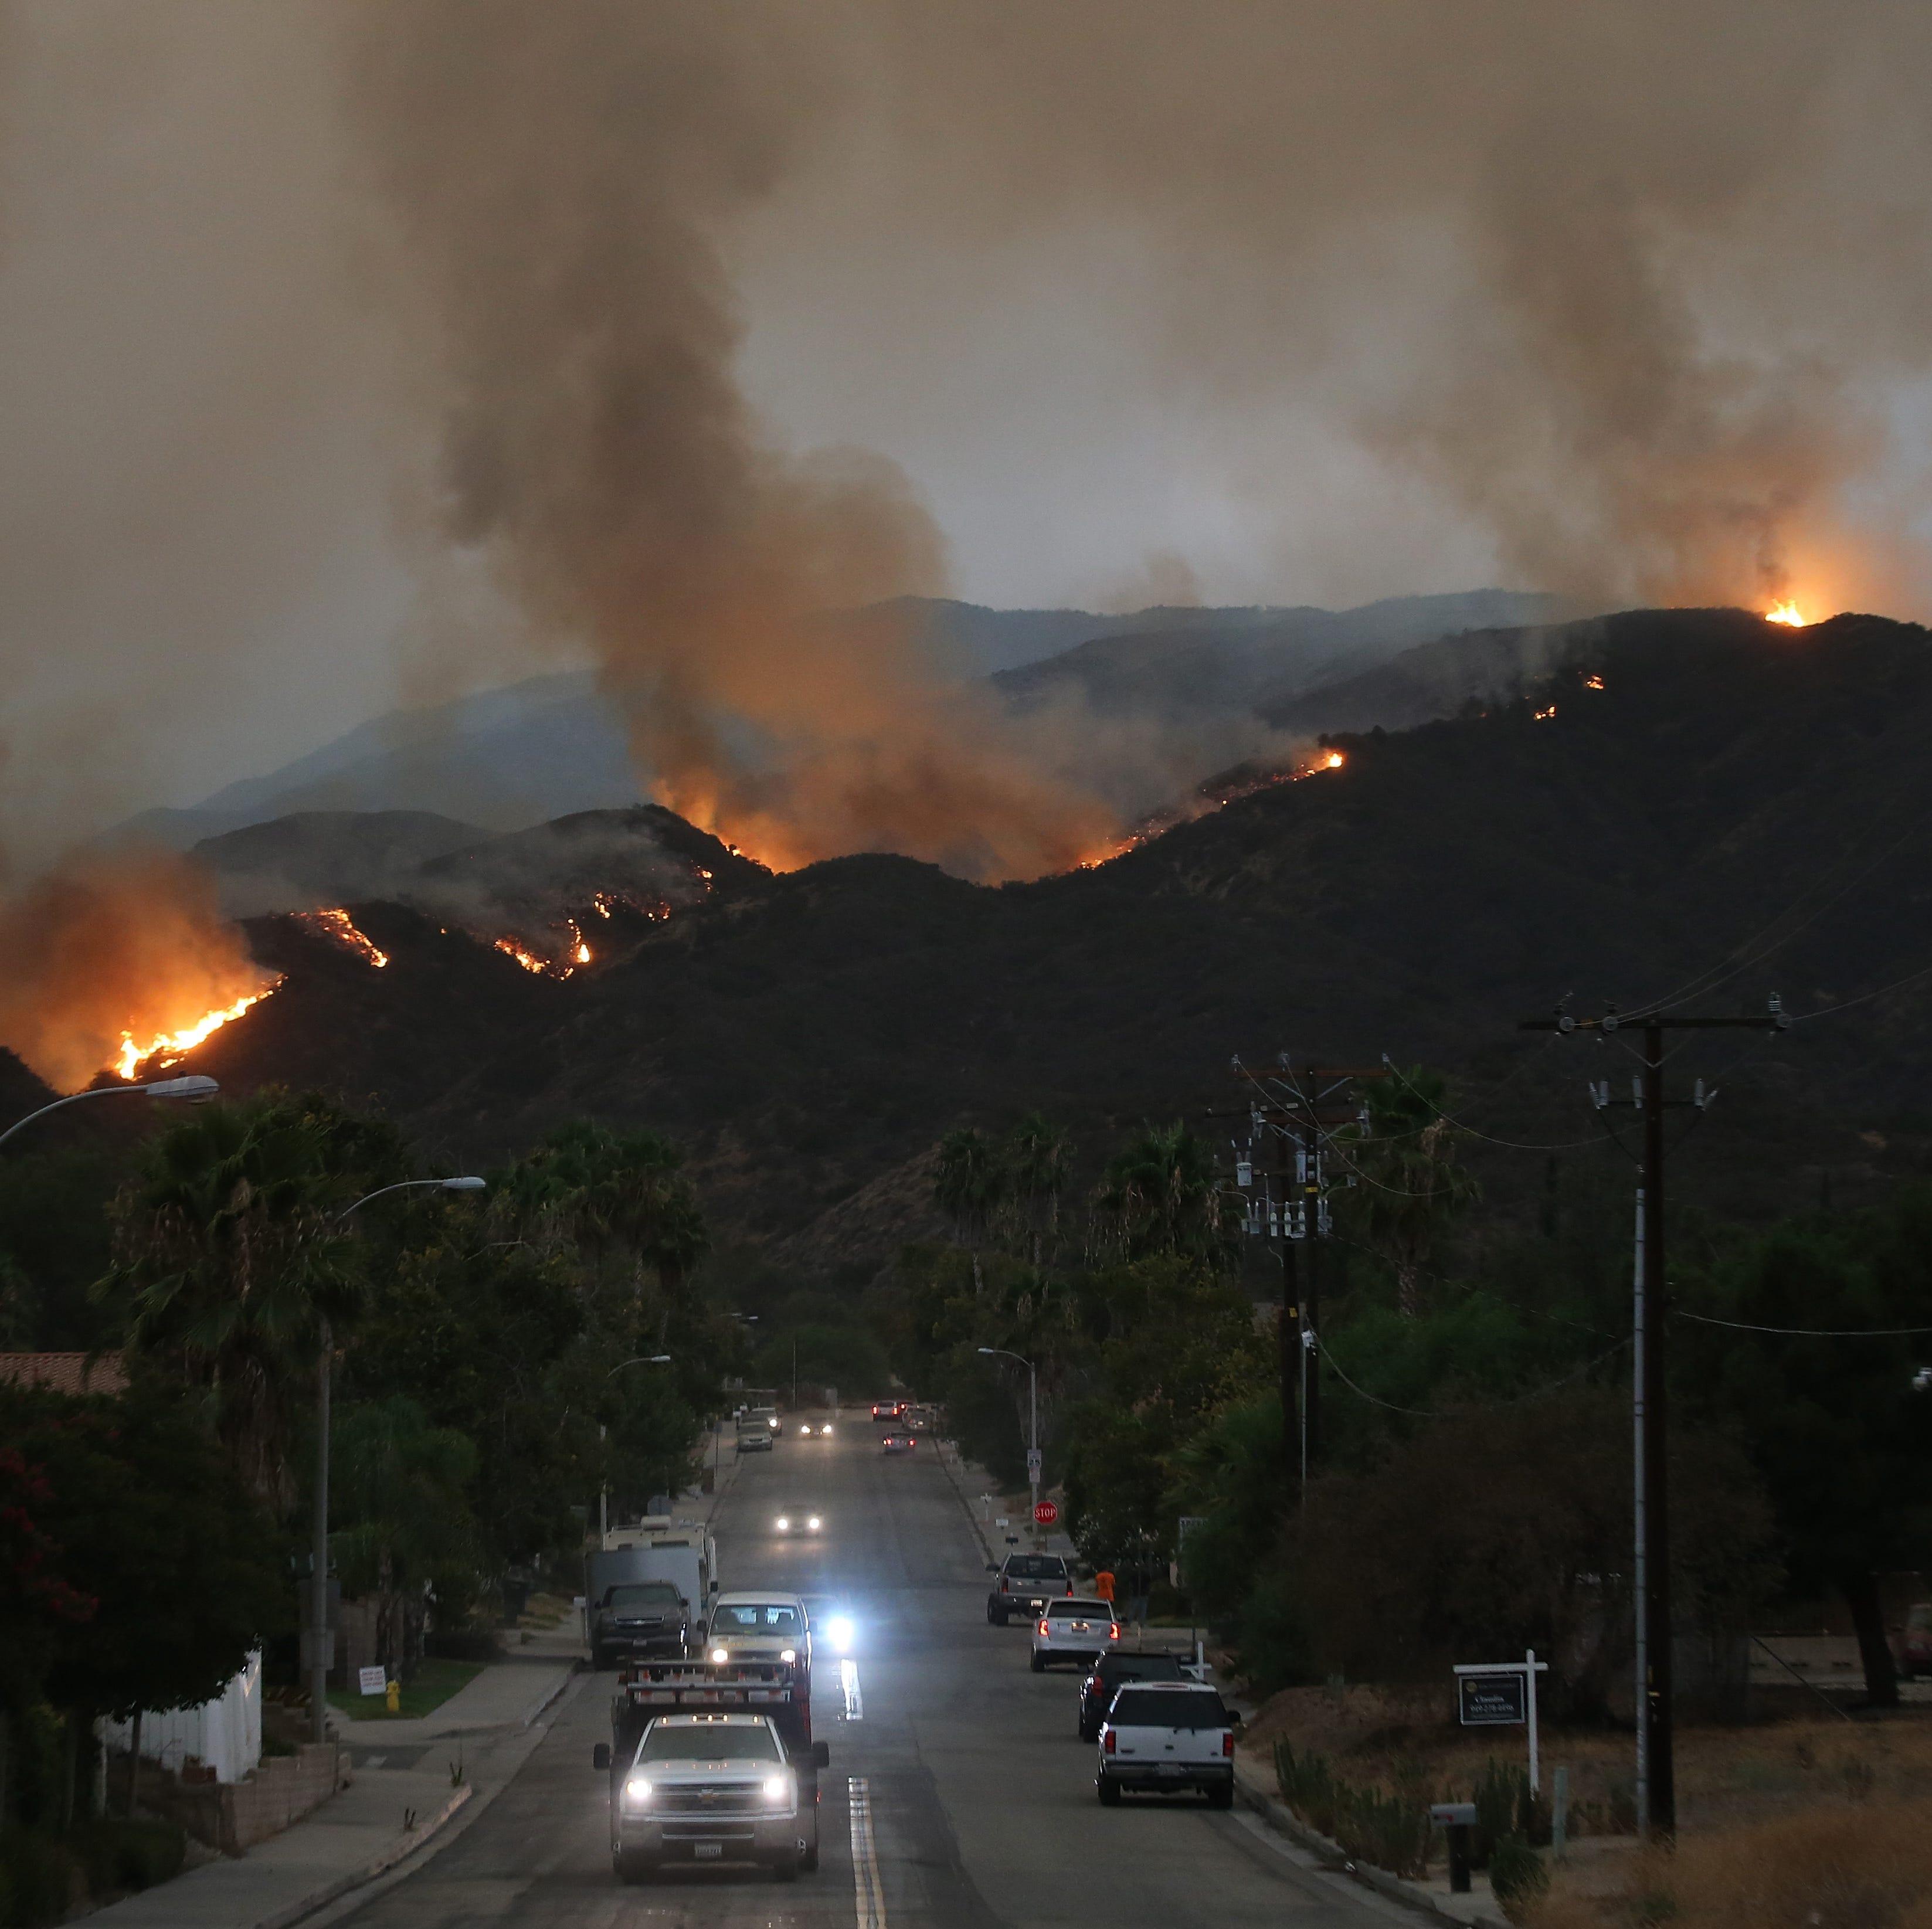 Mandatory evacuations lifted for most neighborhoods near Holy Fire burn scar